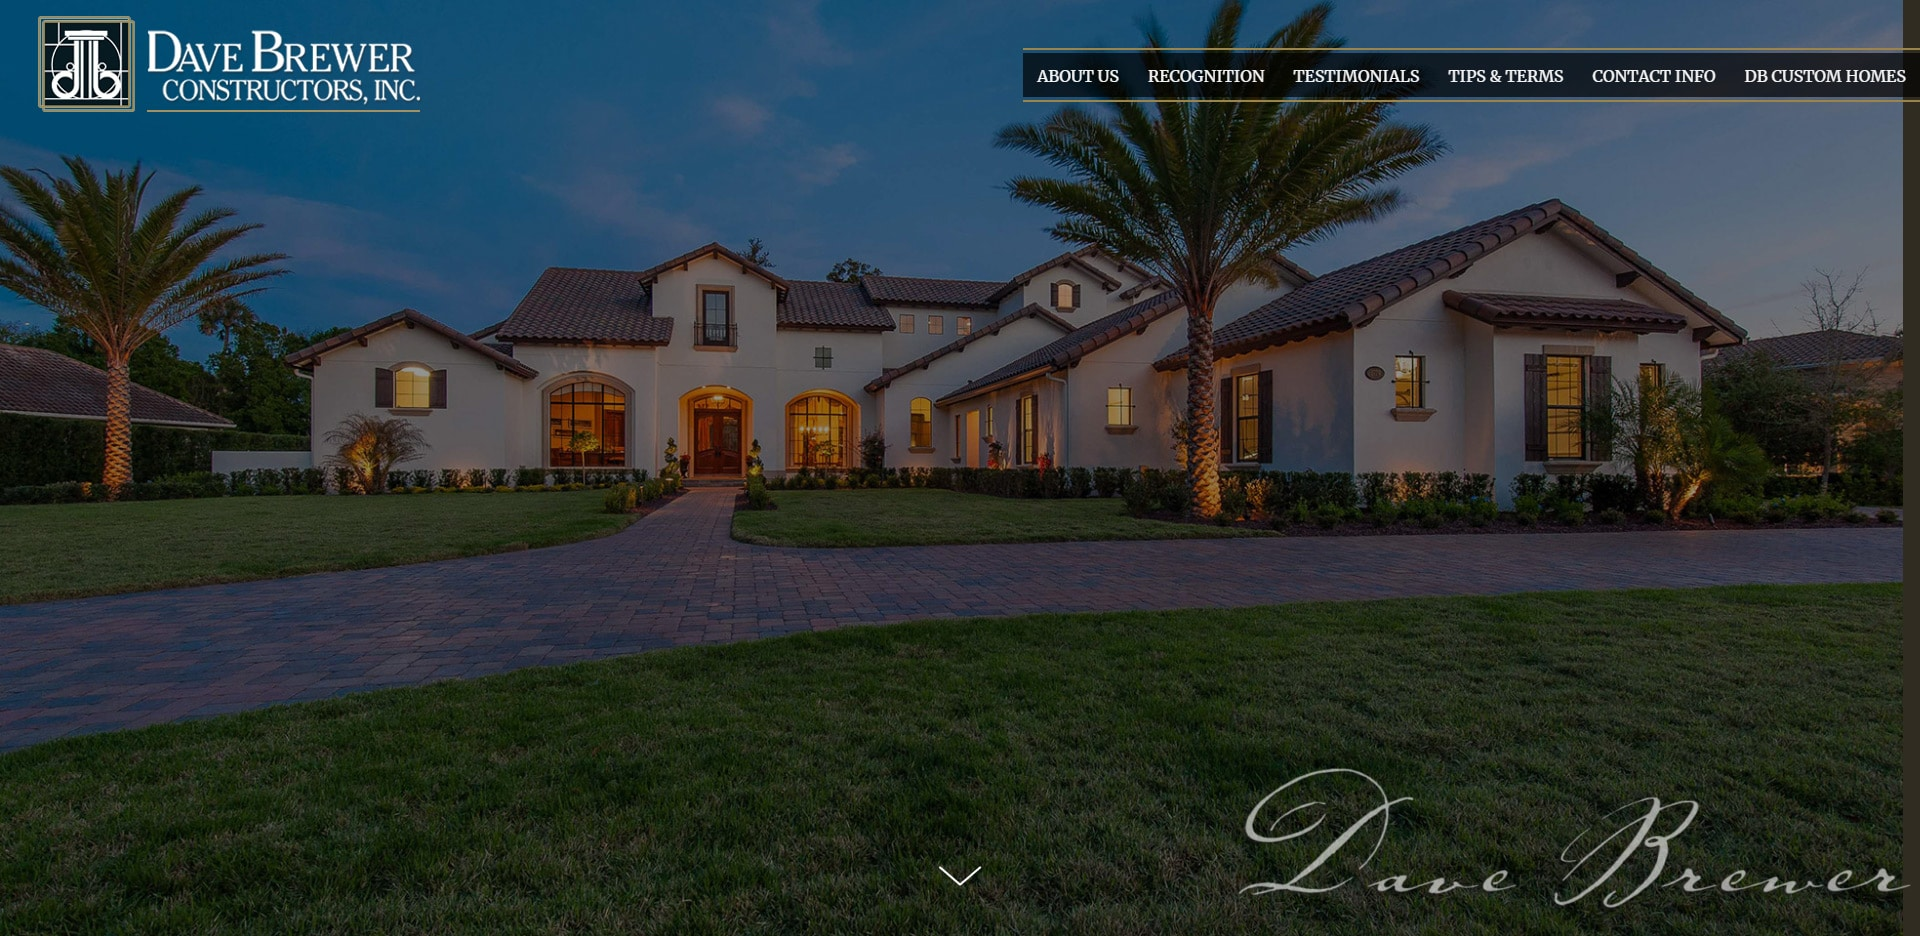 screenshot of website for Dave Brewer Constructors after redesign